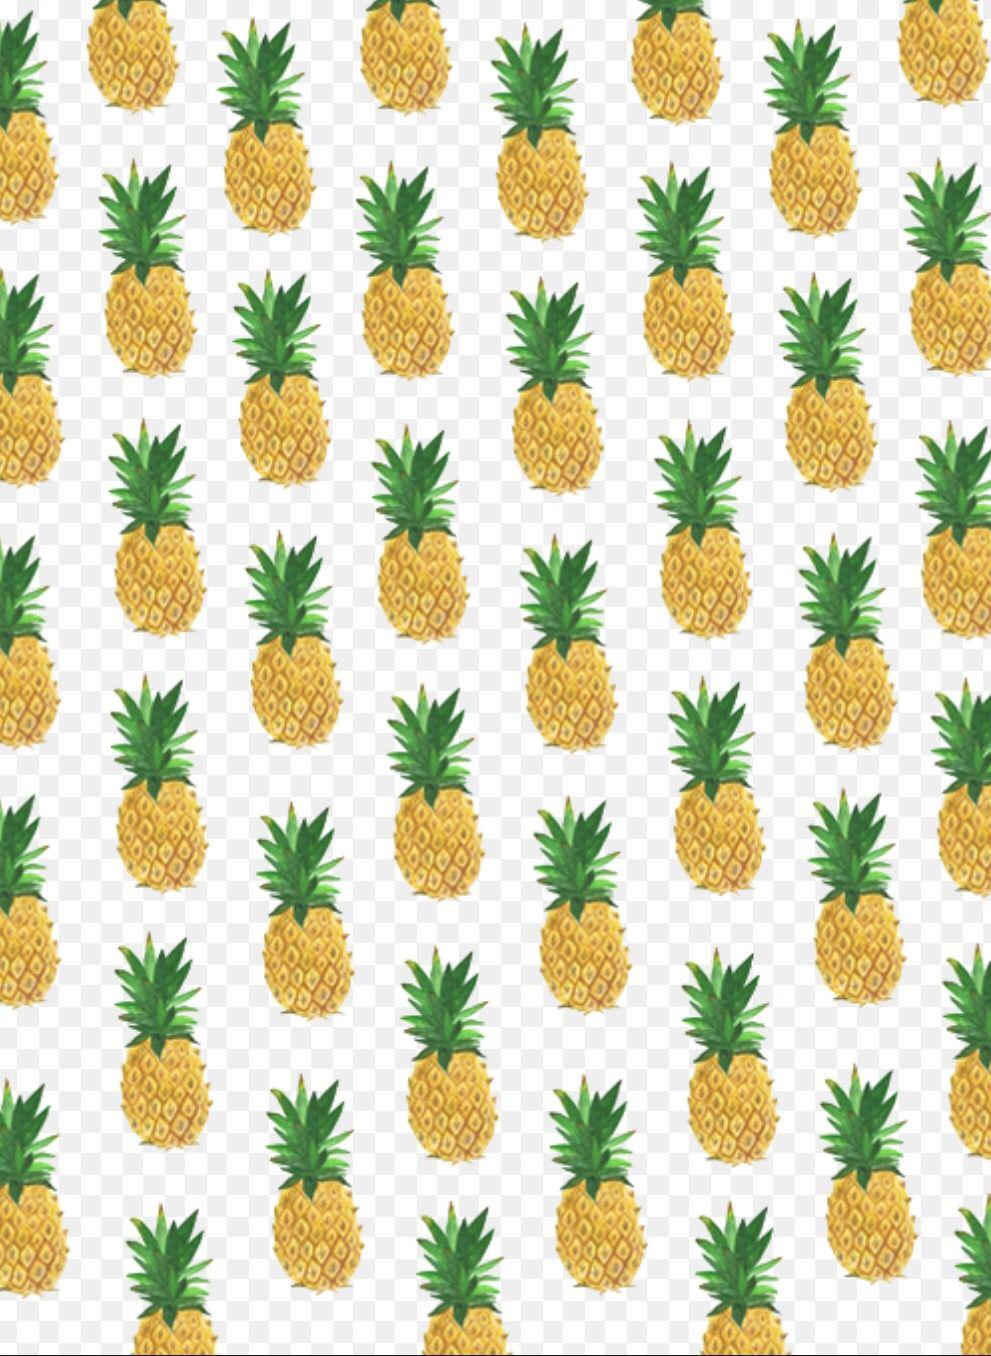 Top Wallpaper Home Screen Pineapple - 6ddc6da78b84aa33116dc7bb422c2708  Photograph_346493.jpg